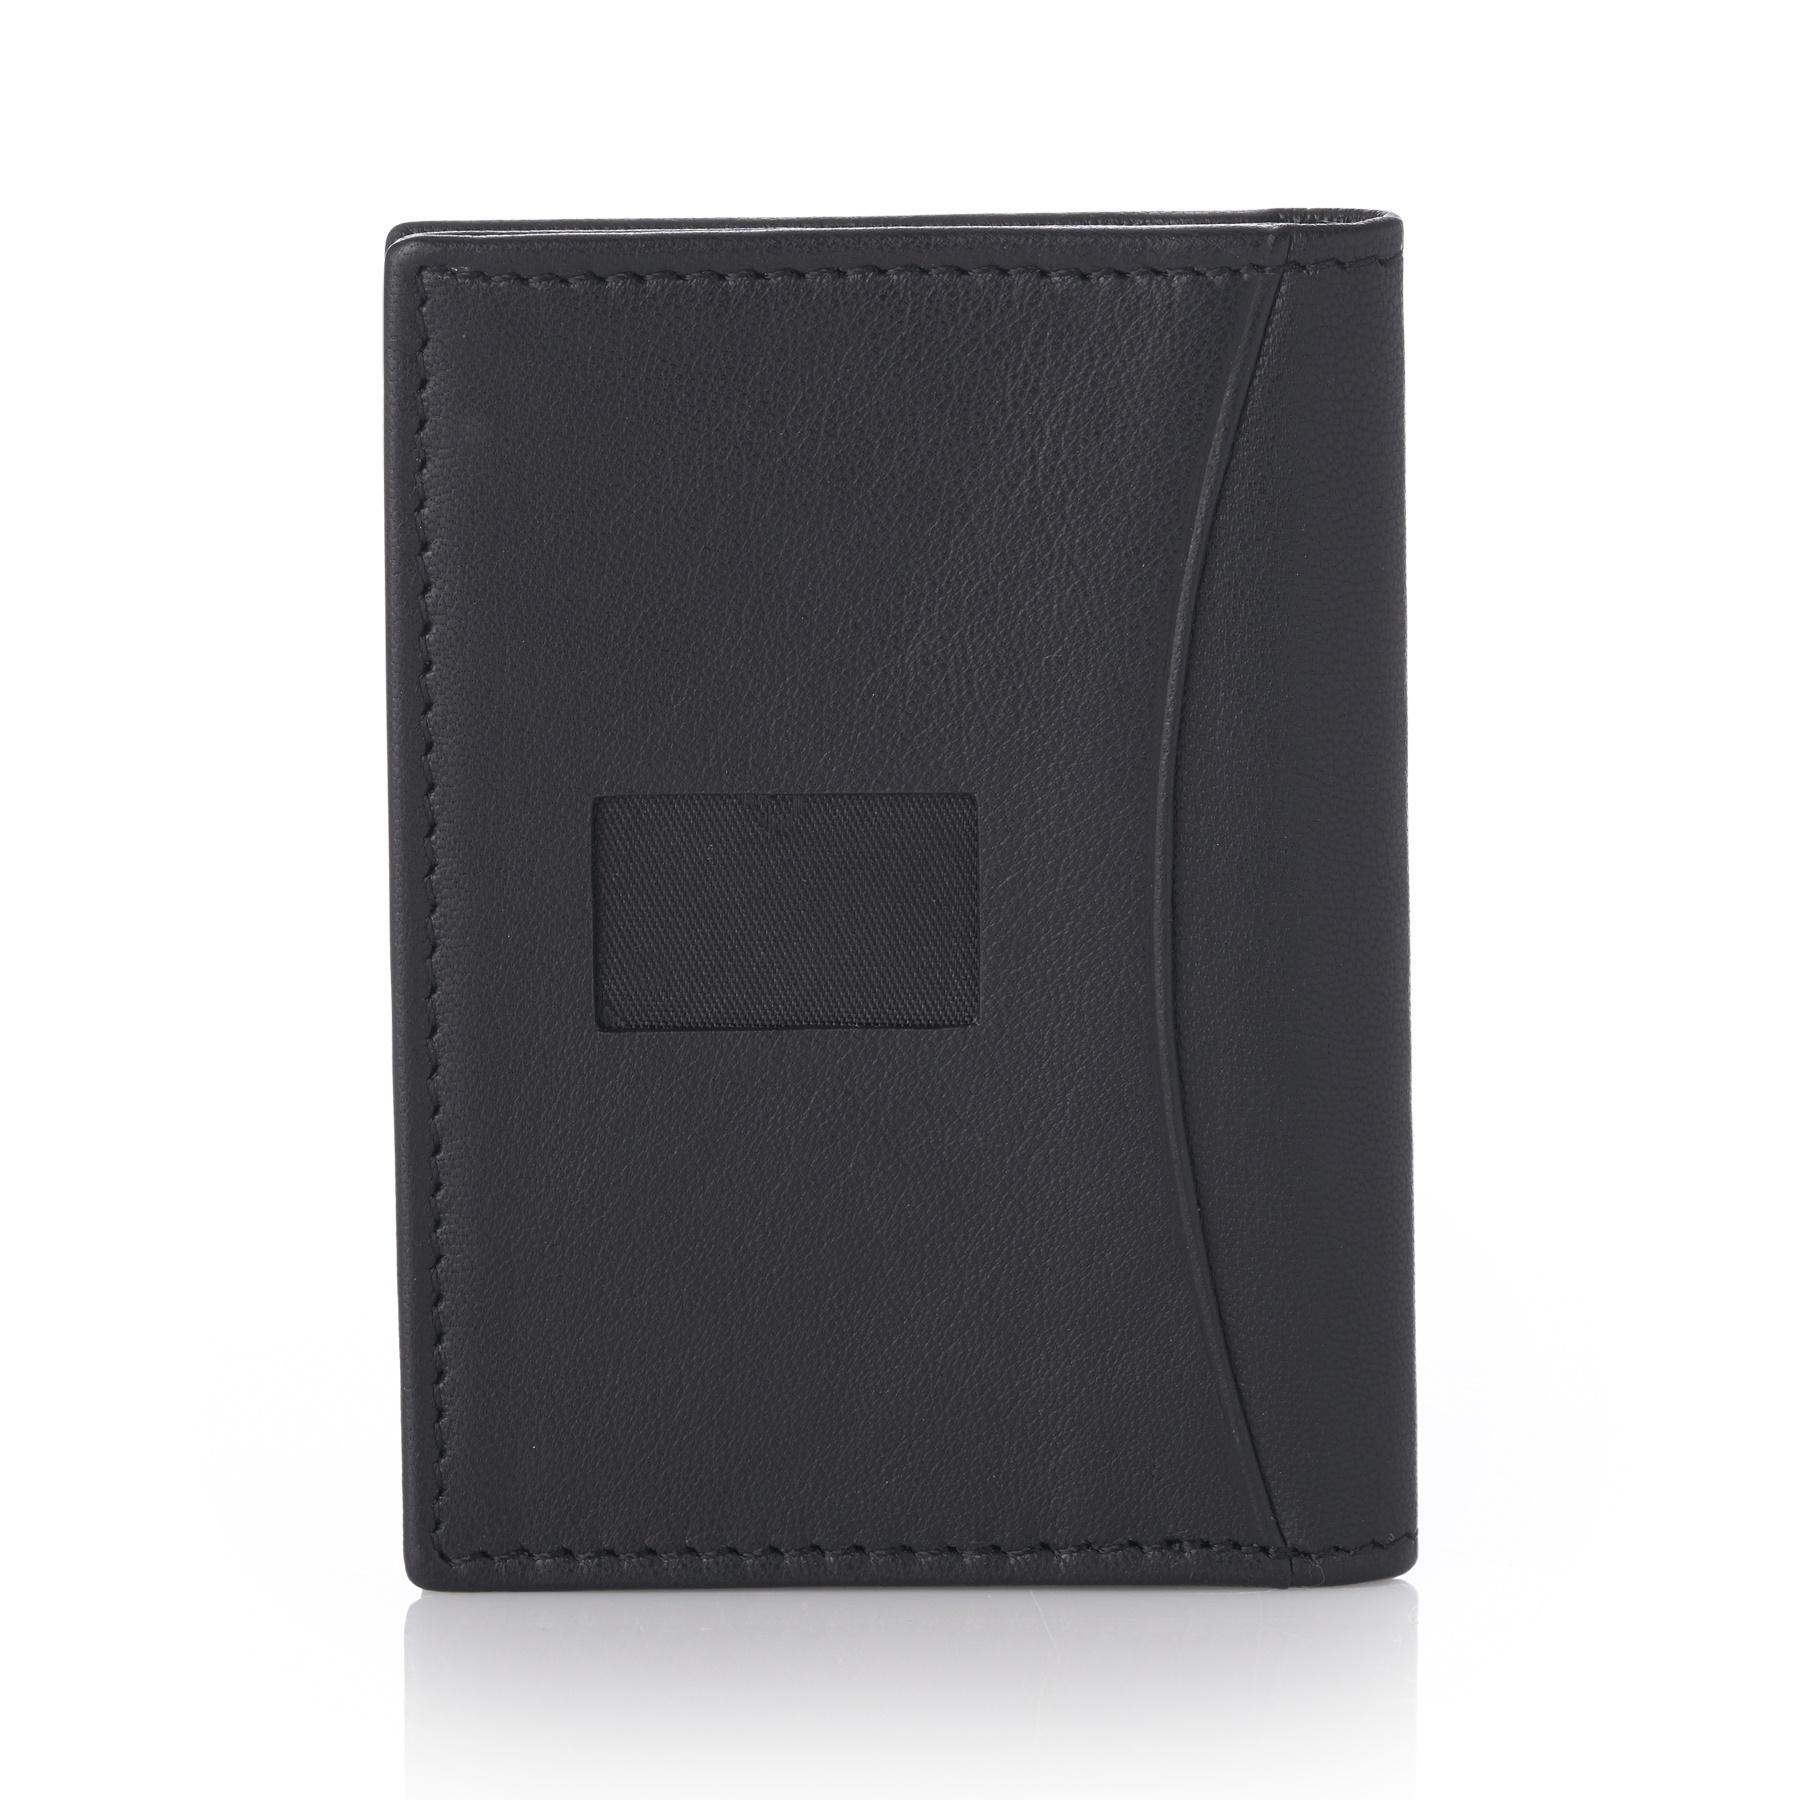 Alpine-Swiss-RFID-Leather-Business-Card-Wallet-Minimalist-ID-Window-Card-Holder thumbnail 14